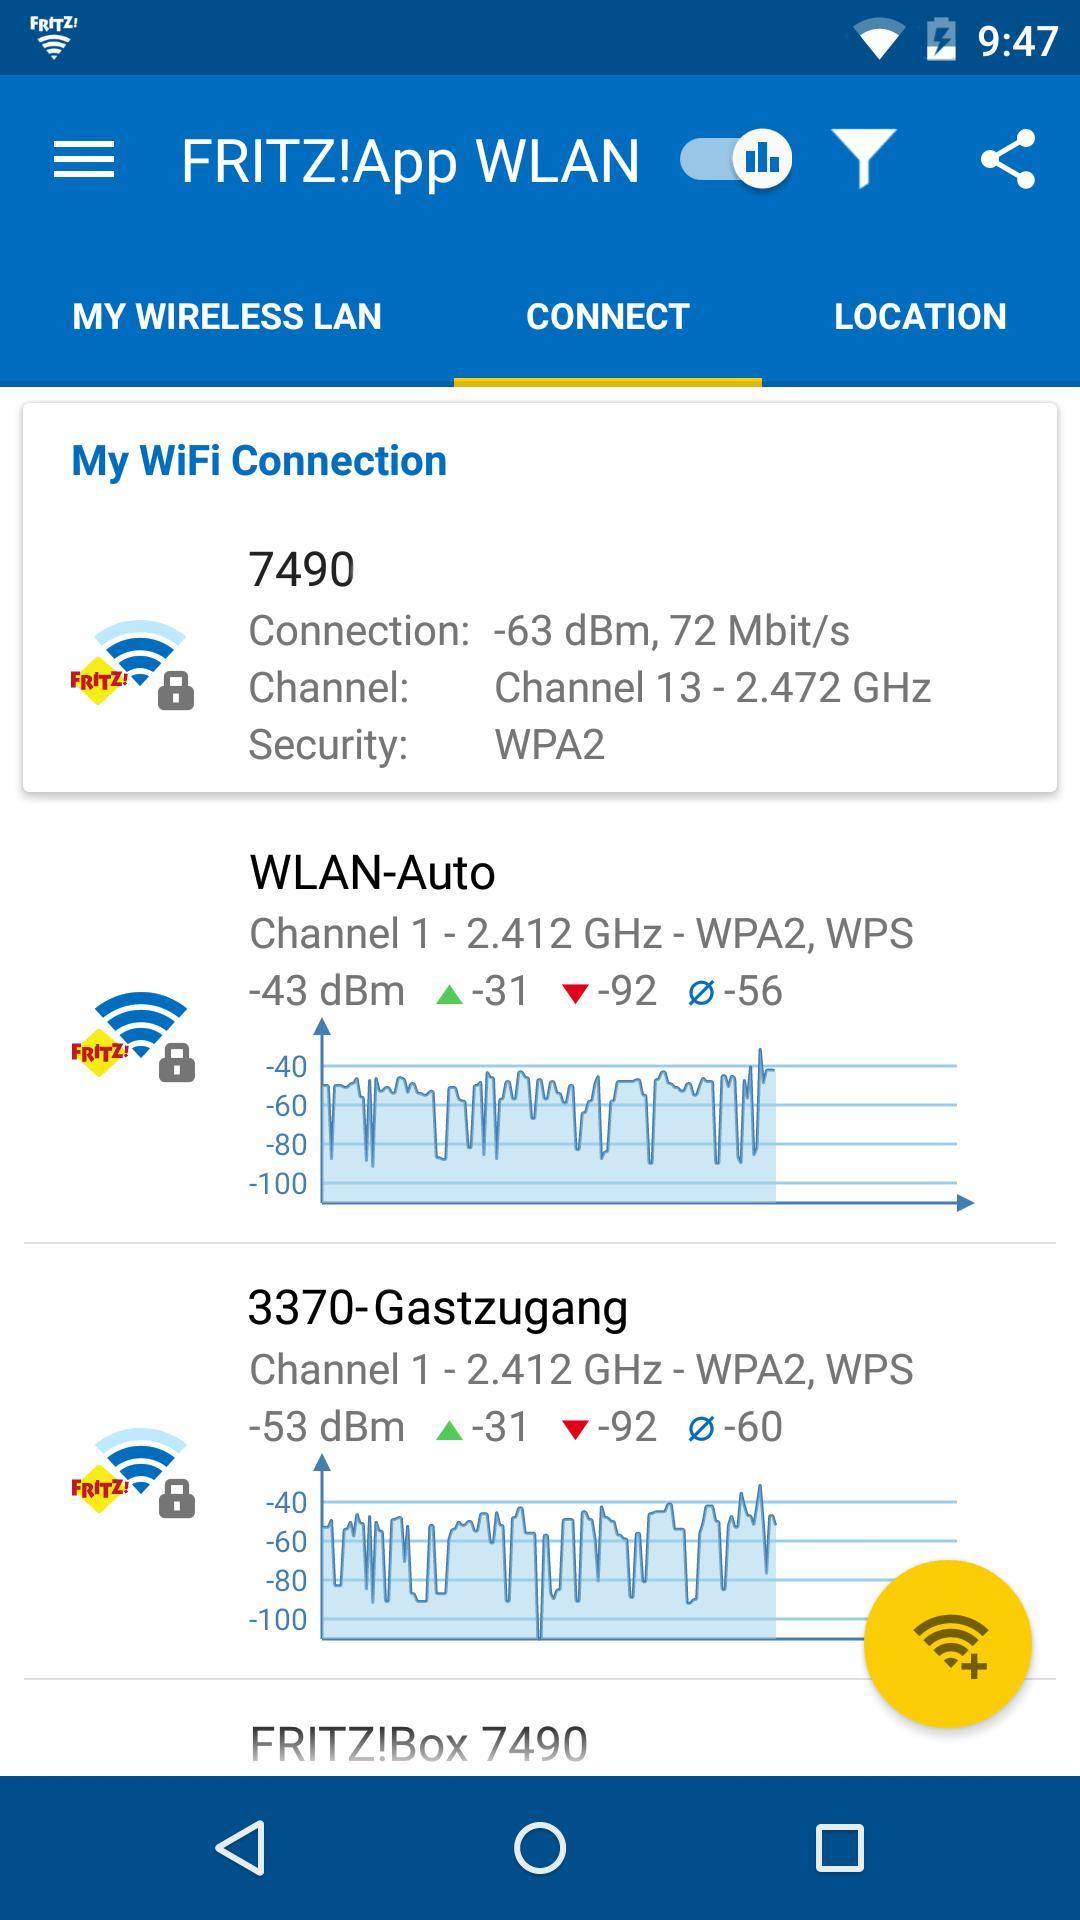 FRITZ!App WLAN 2.8.14 Screenshot 3